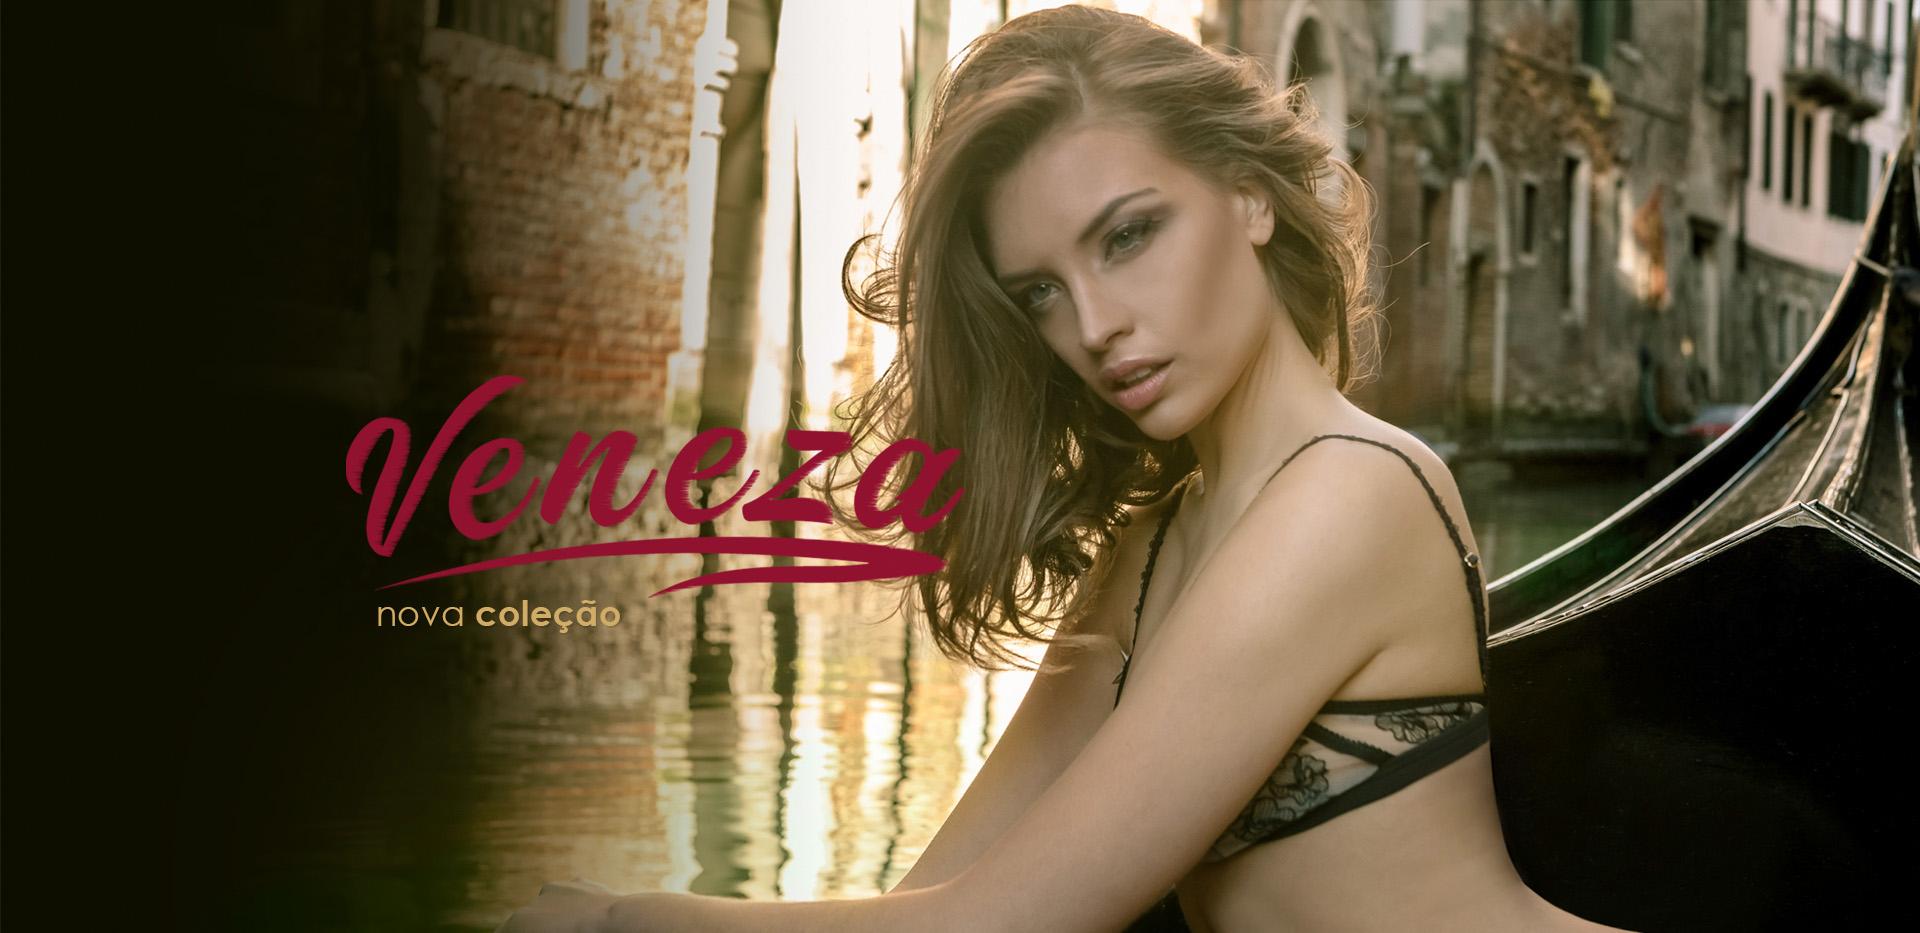 lingerie outono inverno 2017 Veneza